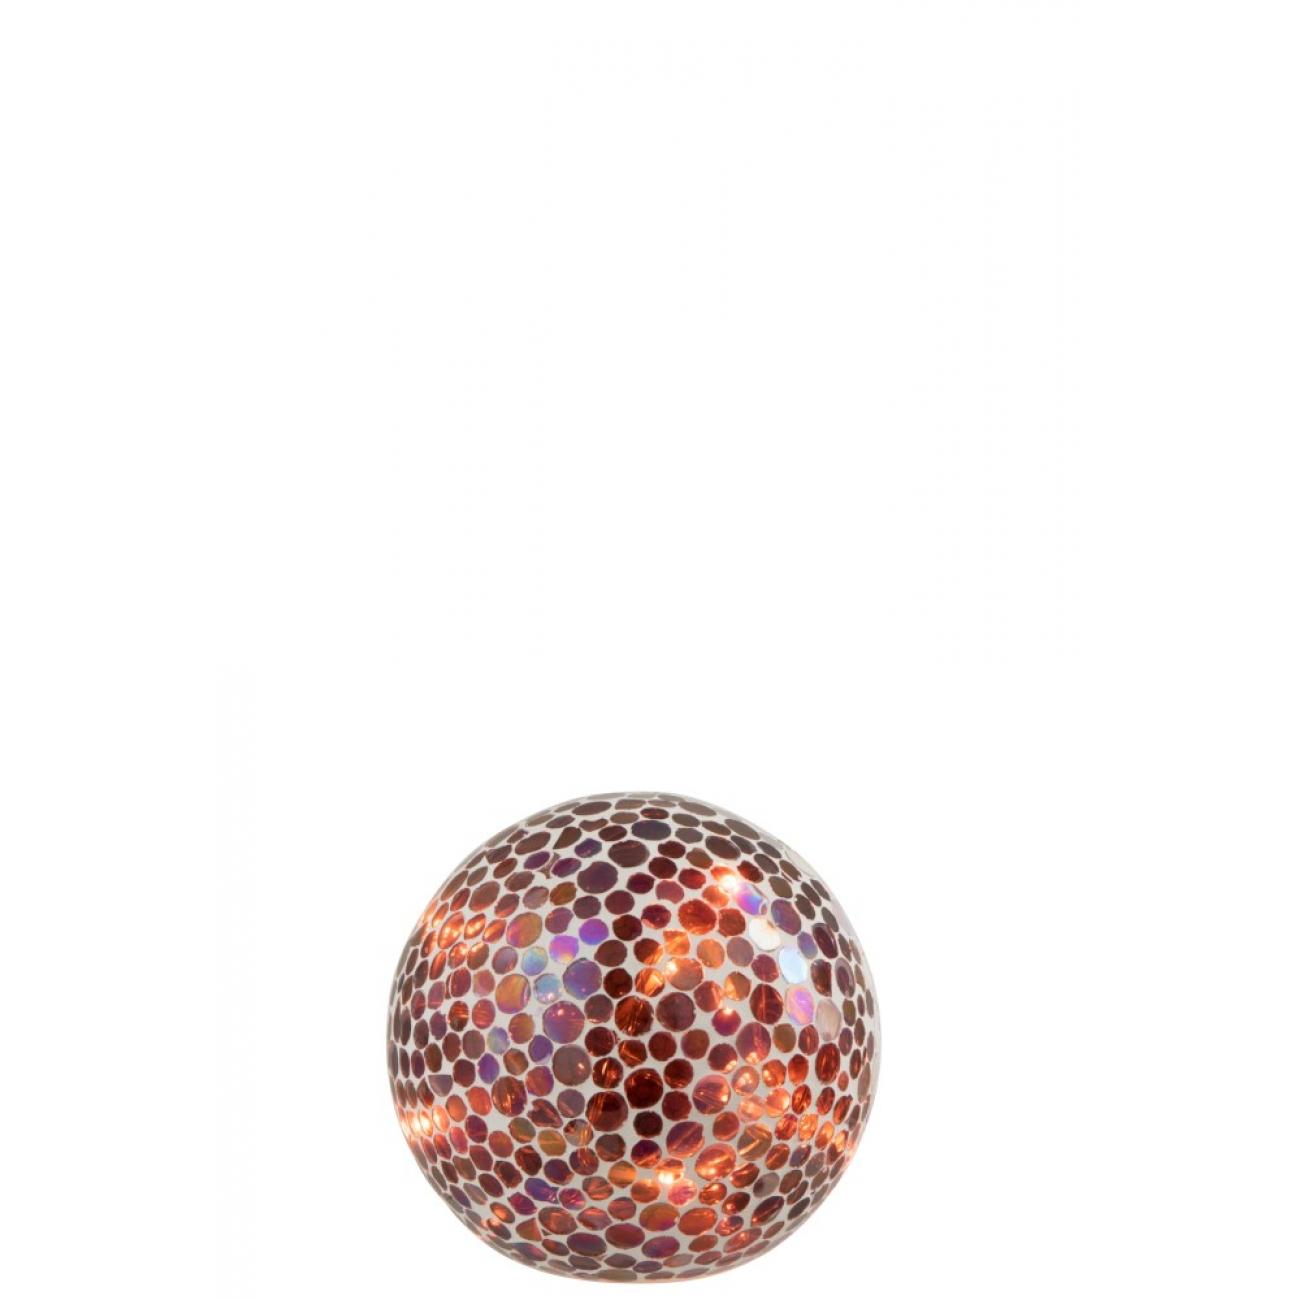 Ночник  J-LINE лед лампа в форме мозаичного шара диаметр 15 см